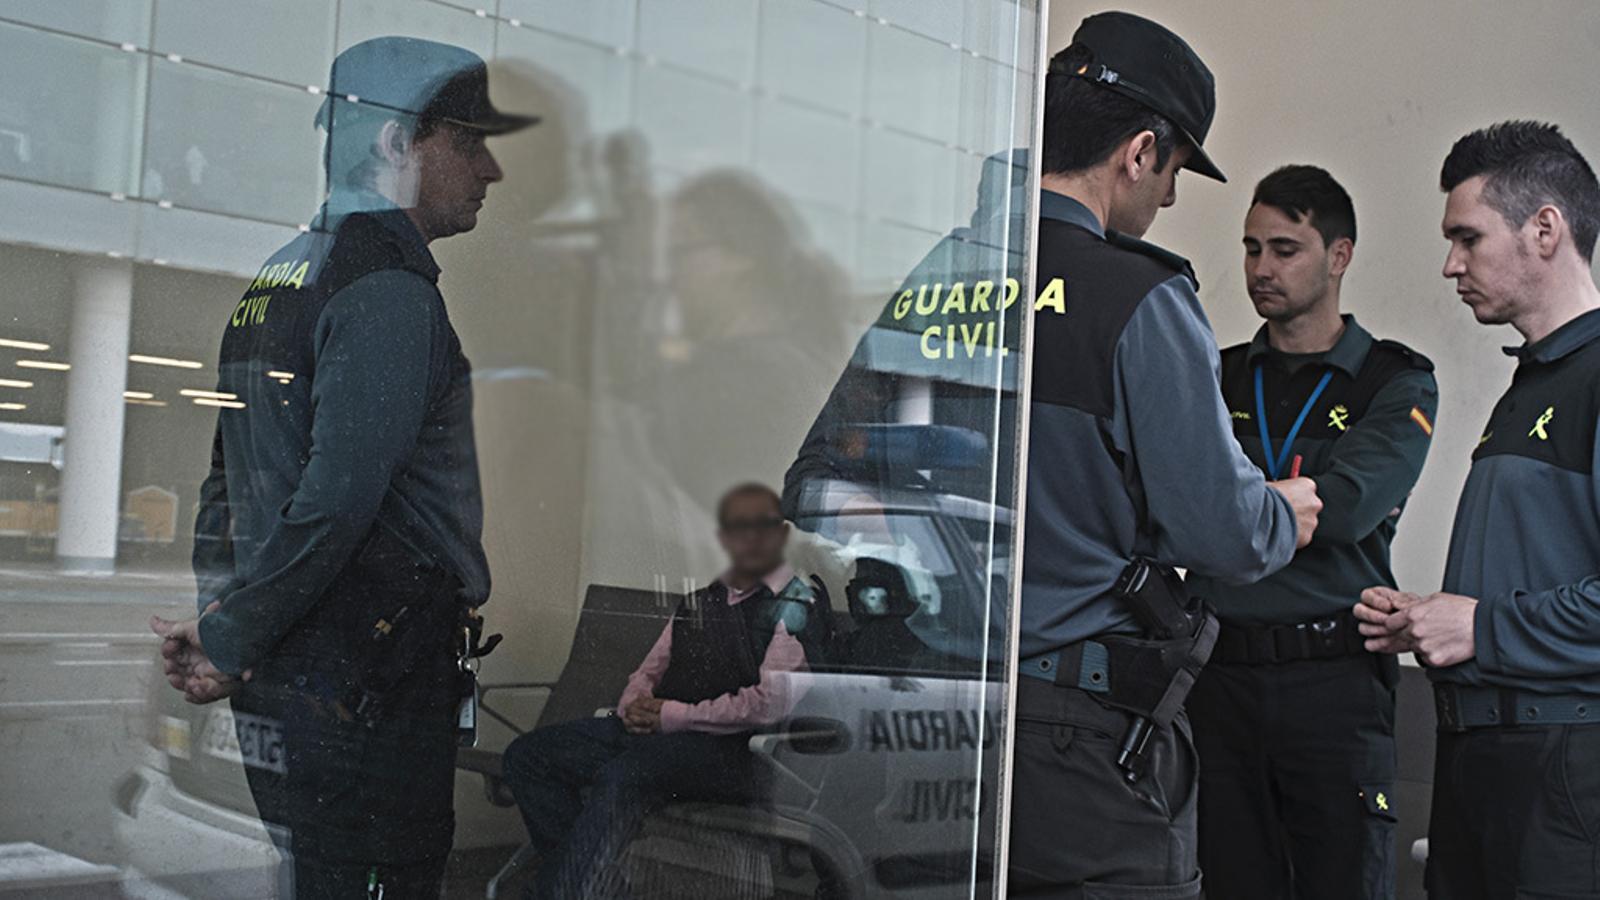 Agents infiltrats intenten introduir bombes a l'aeroport